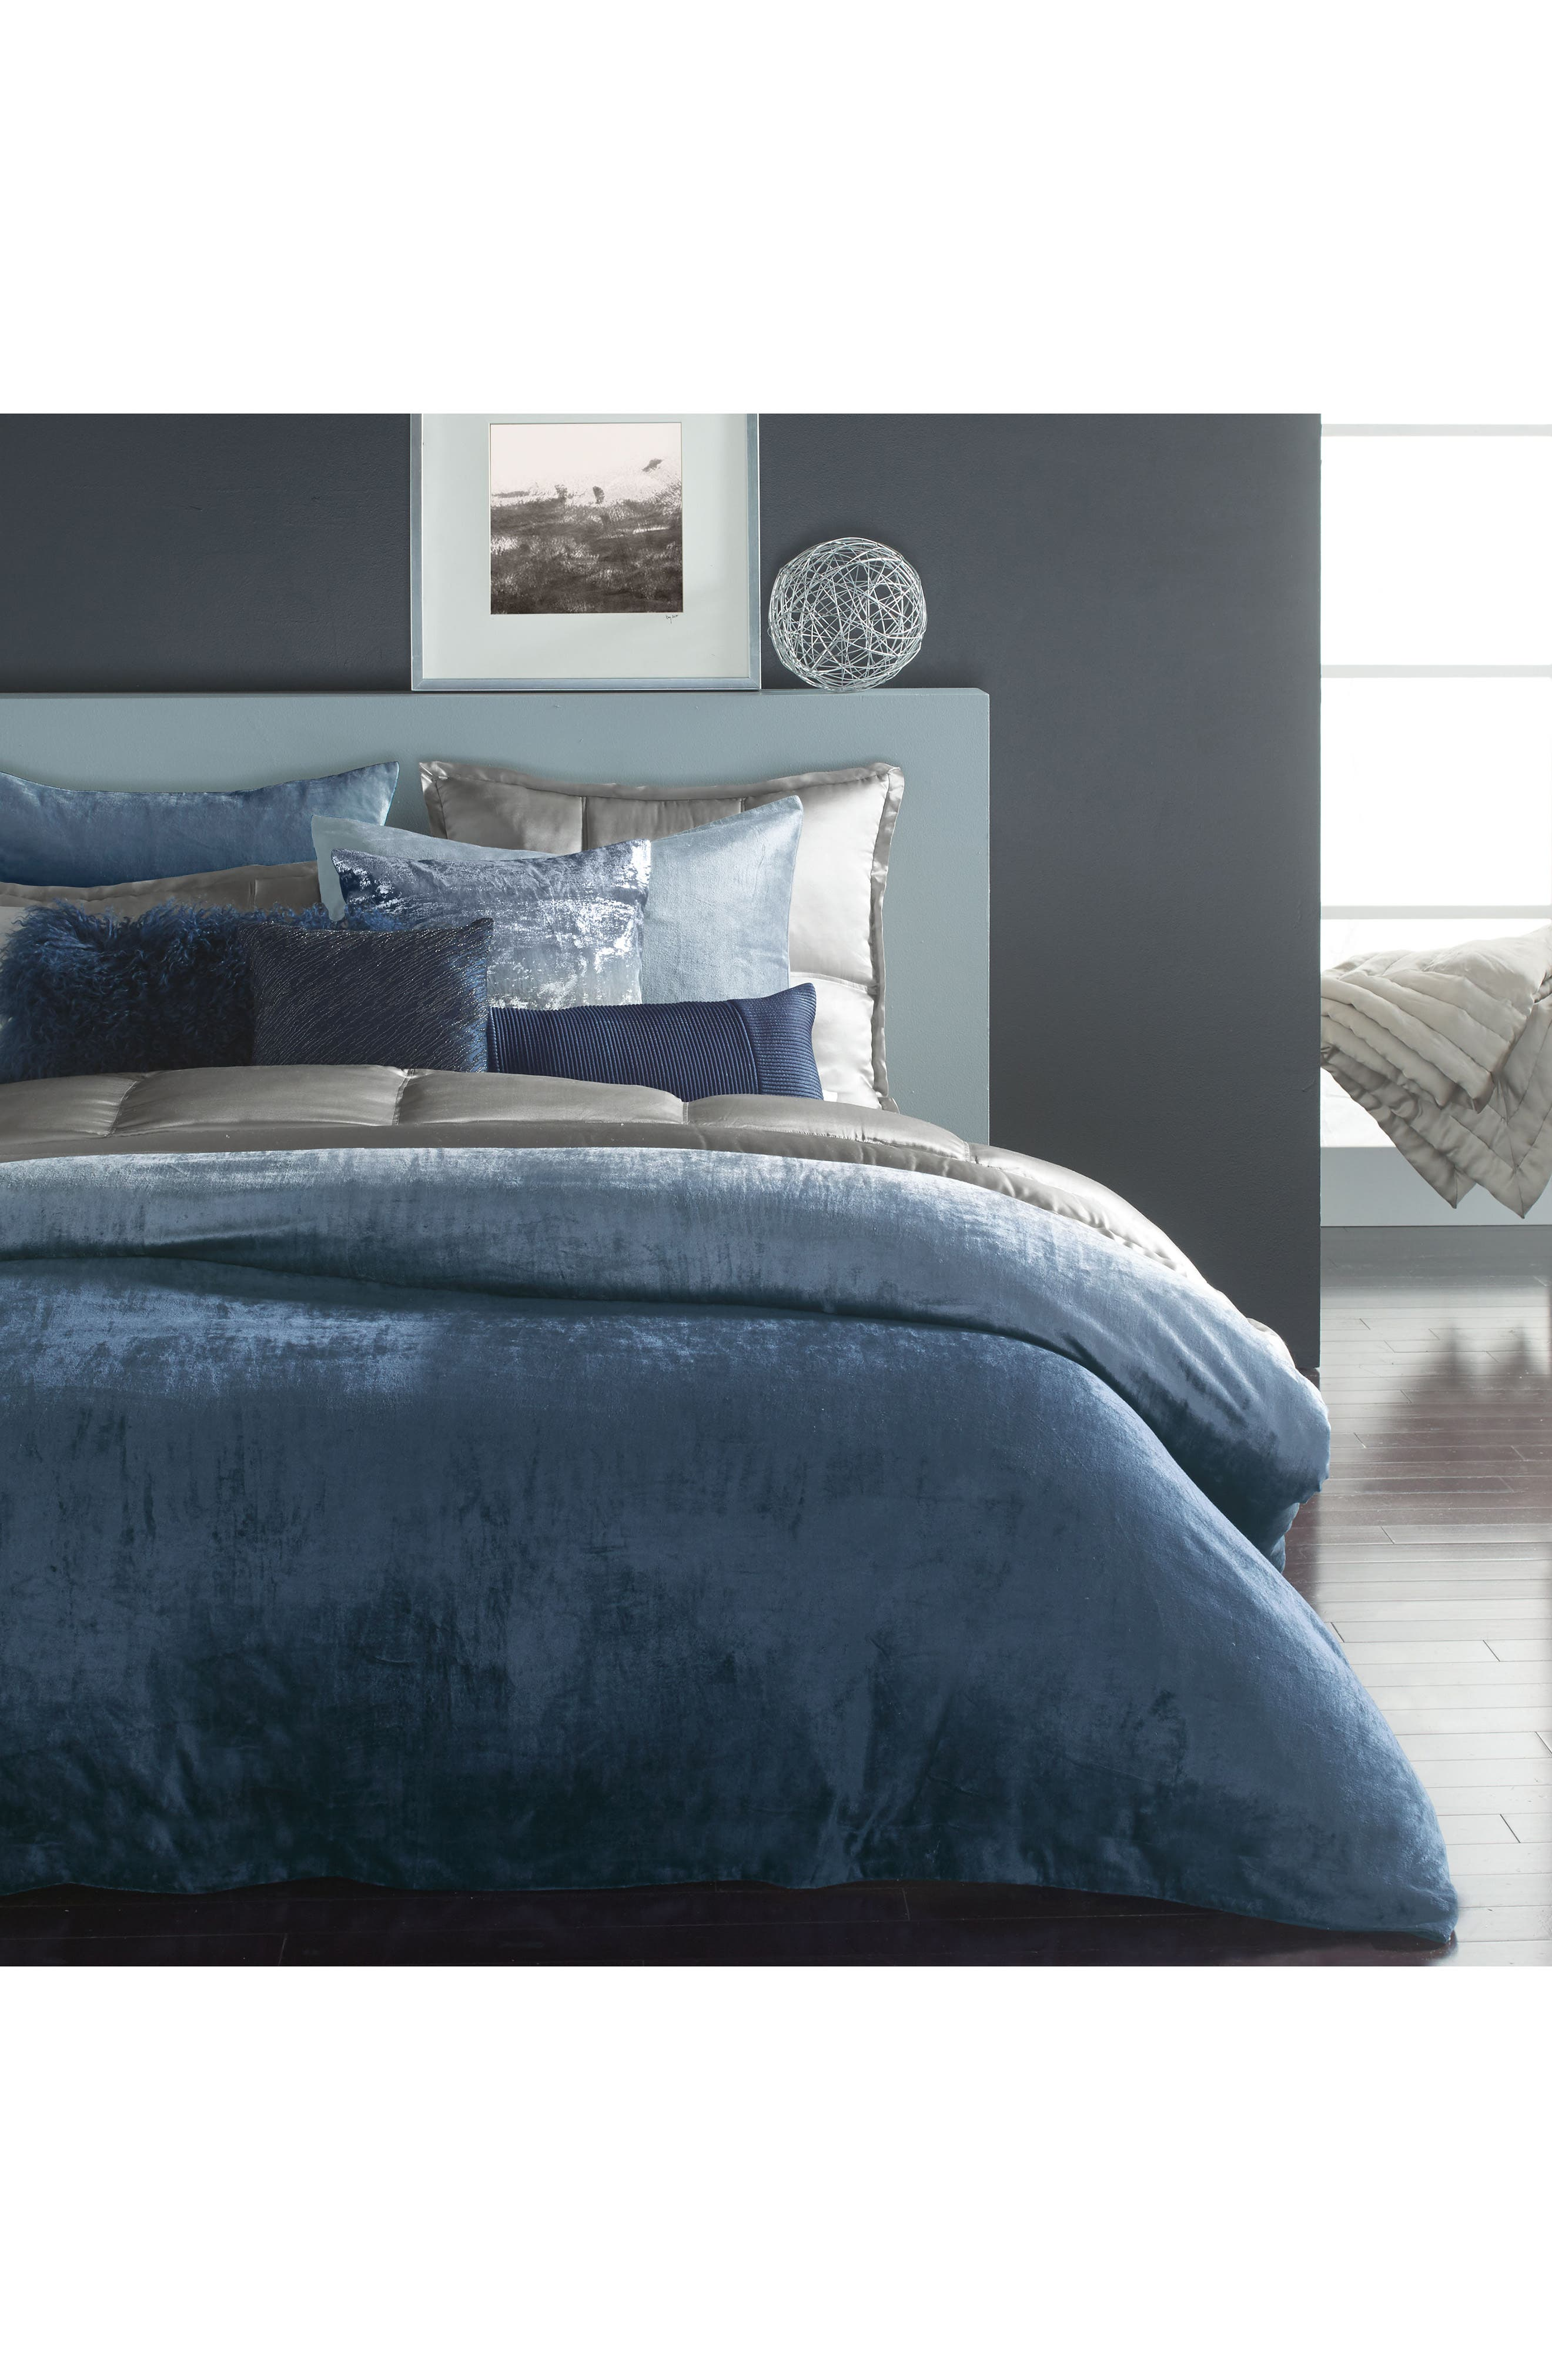 Donna Karan New York Ocean Duvet Cover